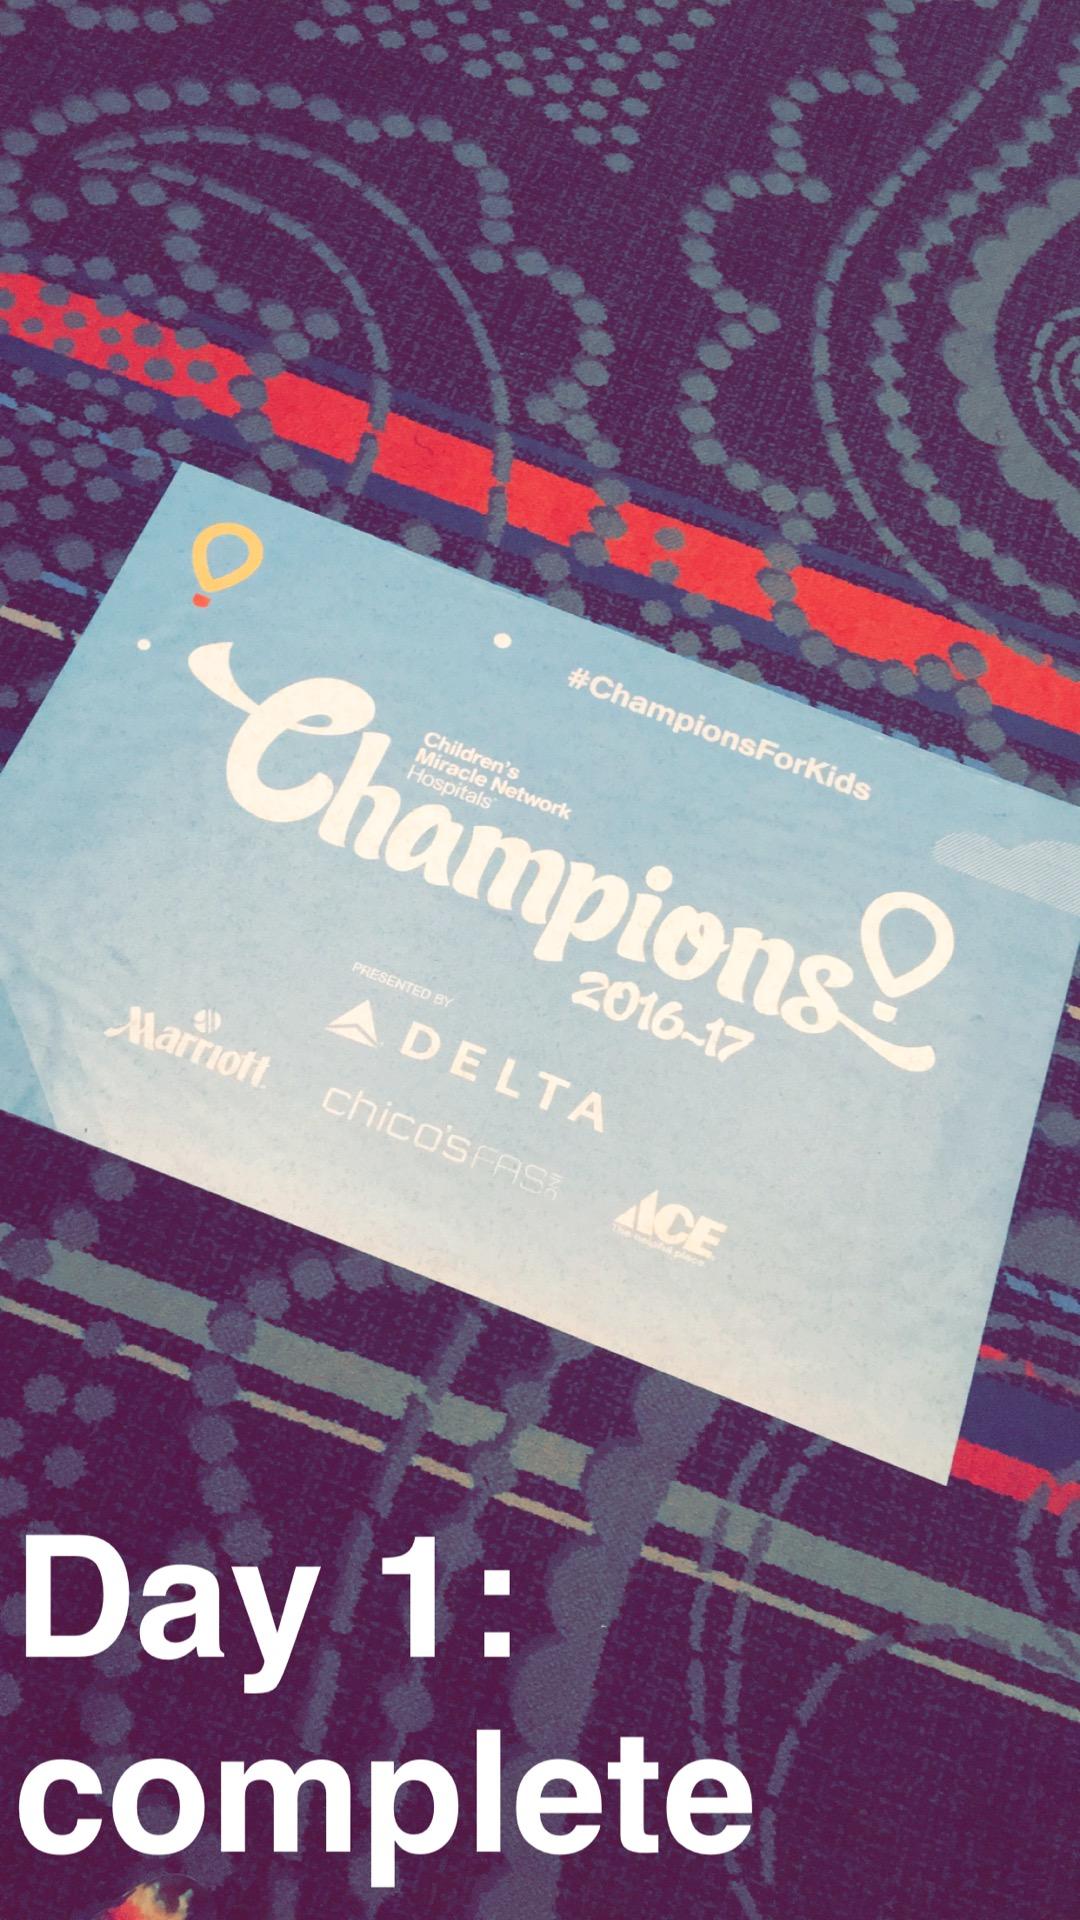 Champions day 1, June 25, 2016 0520